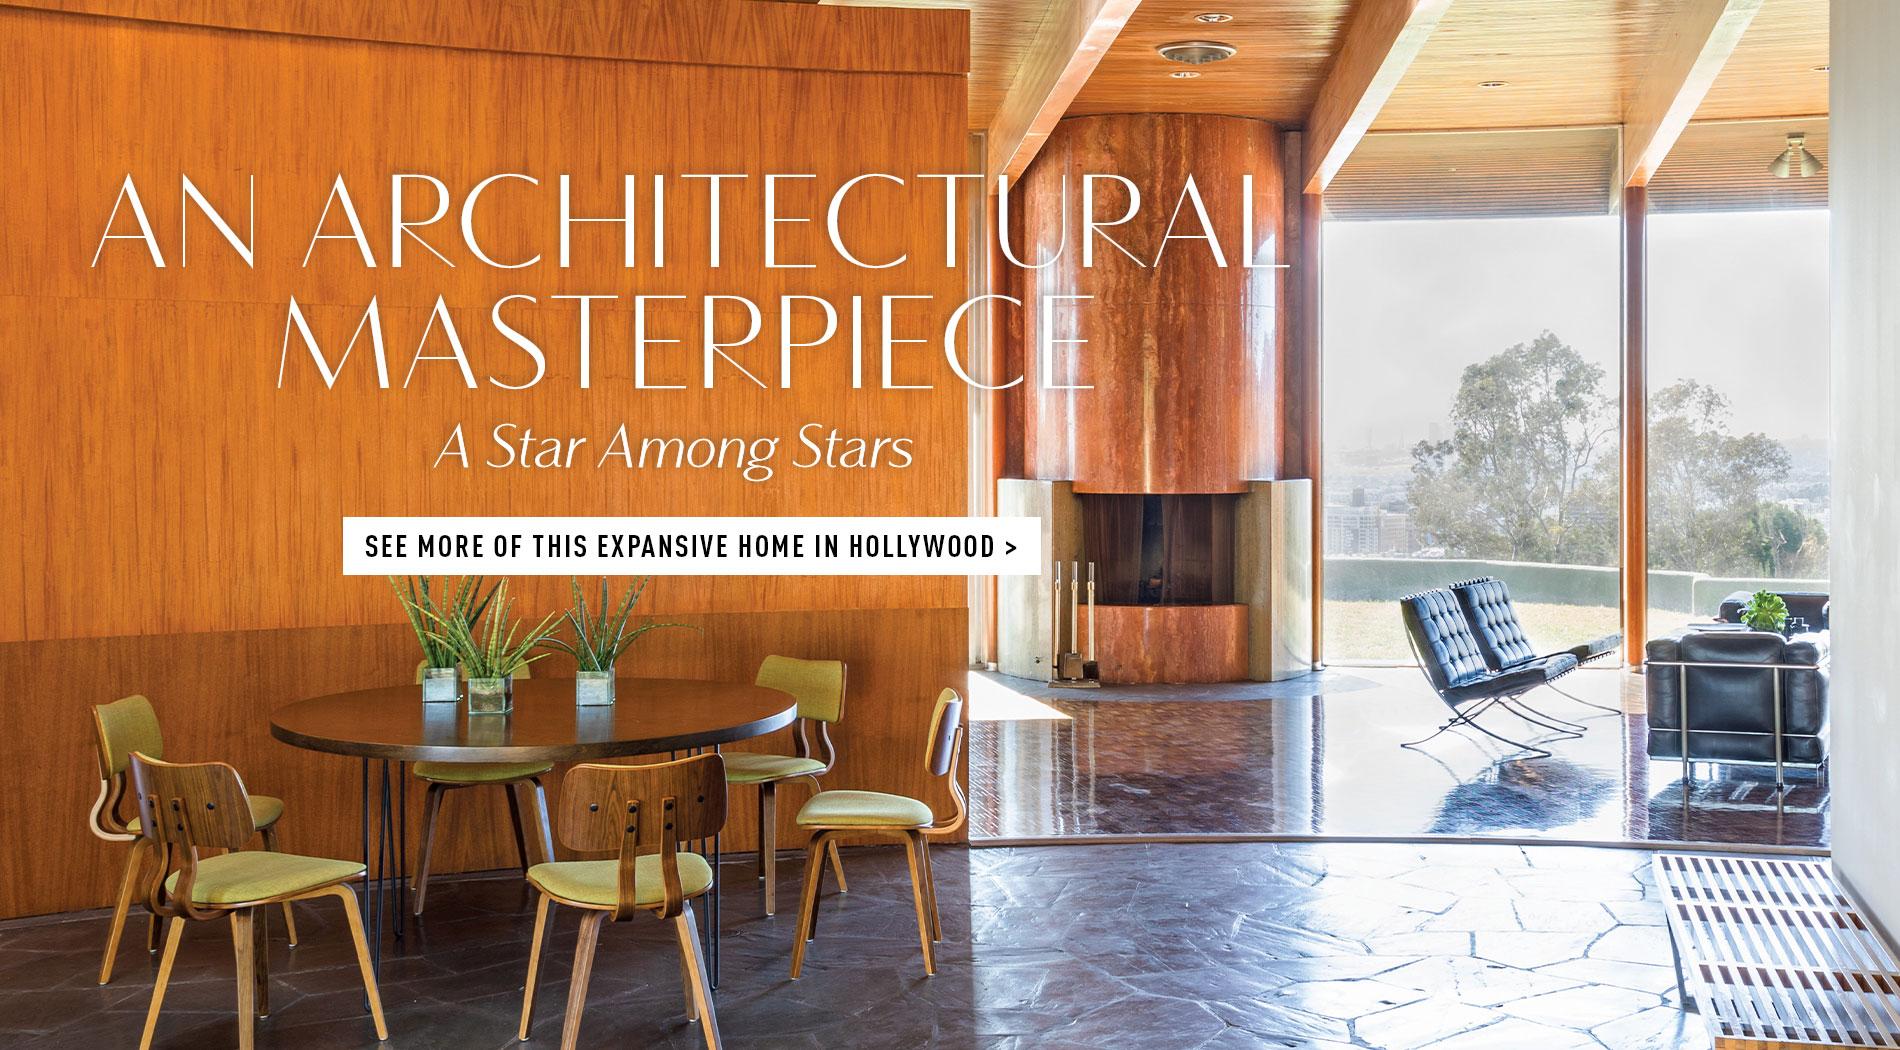 VIE Magazine - Decor and Home Issue - June 2020 - John Lautner, Hollywood Hills, Kelly Lynch, Mitch Glazer, Sara Essex Bradley